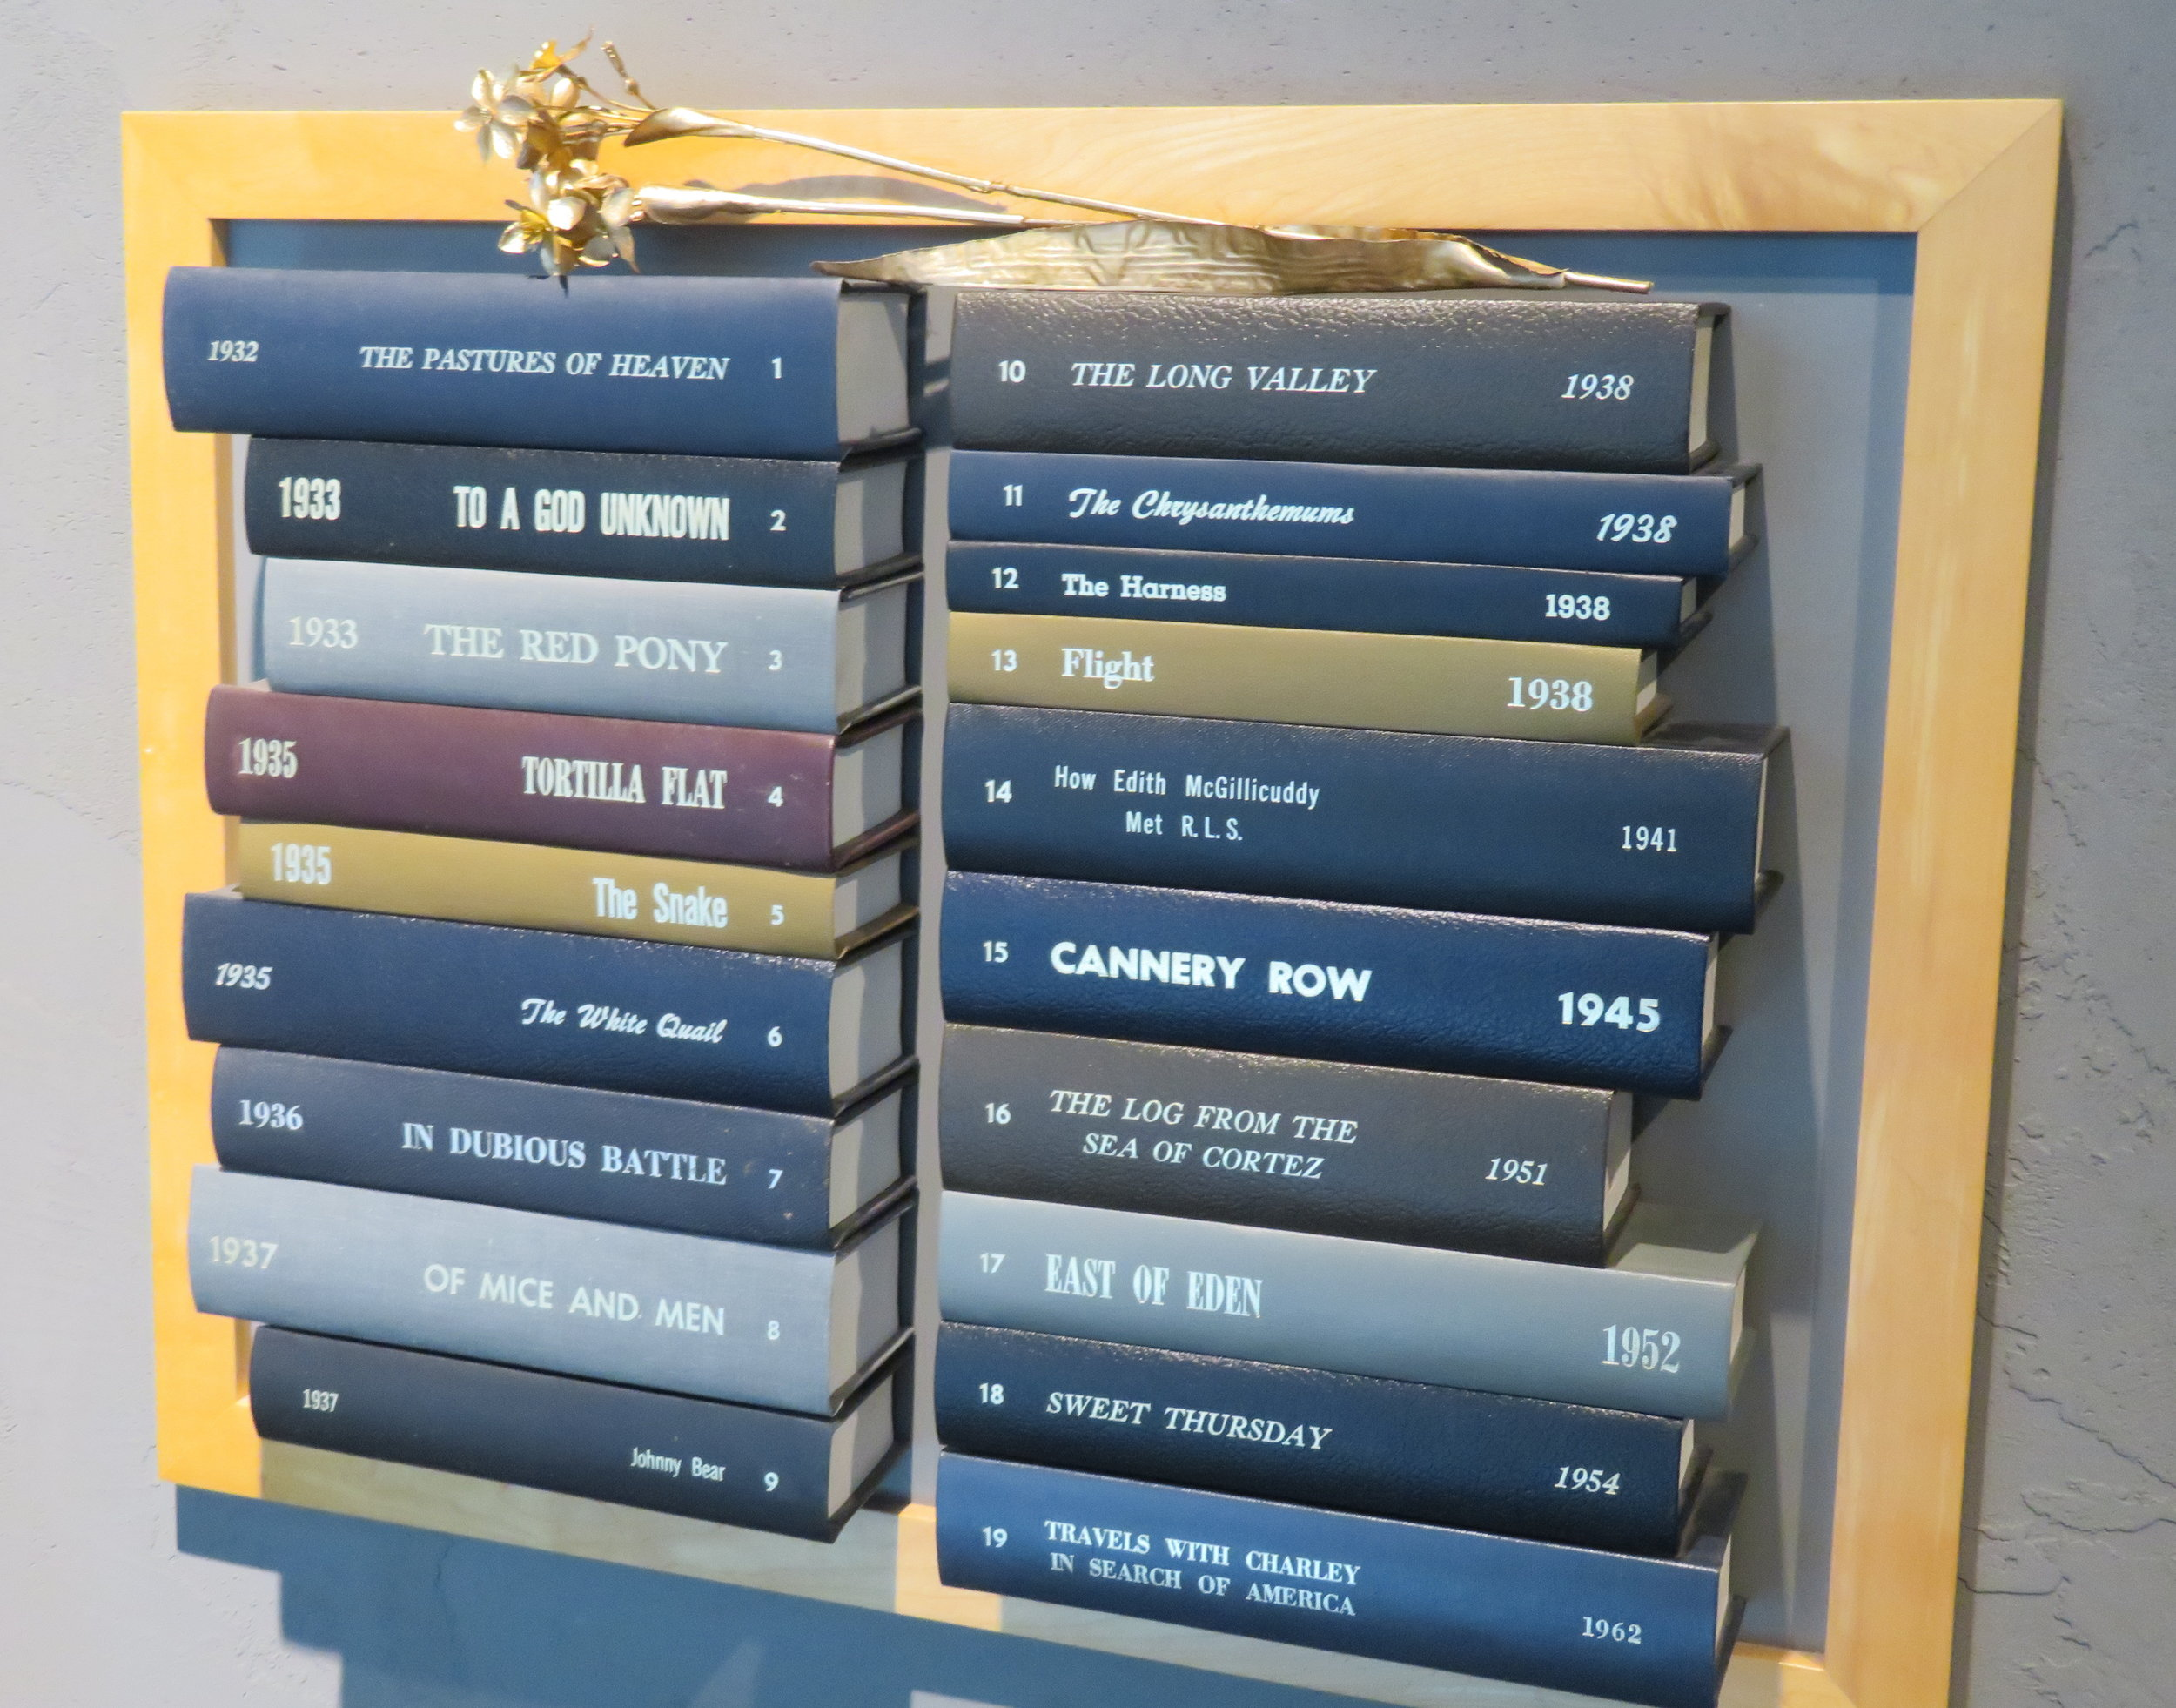 salinas_so many books.JPG